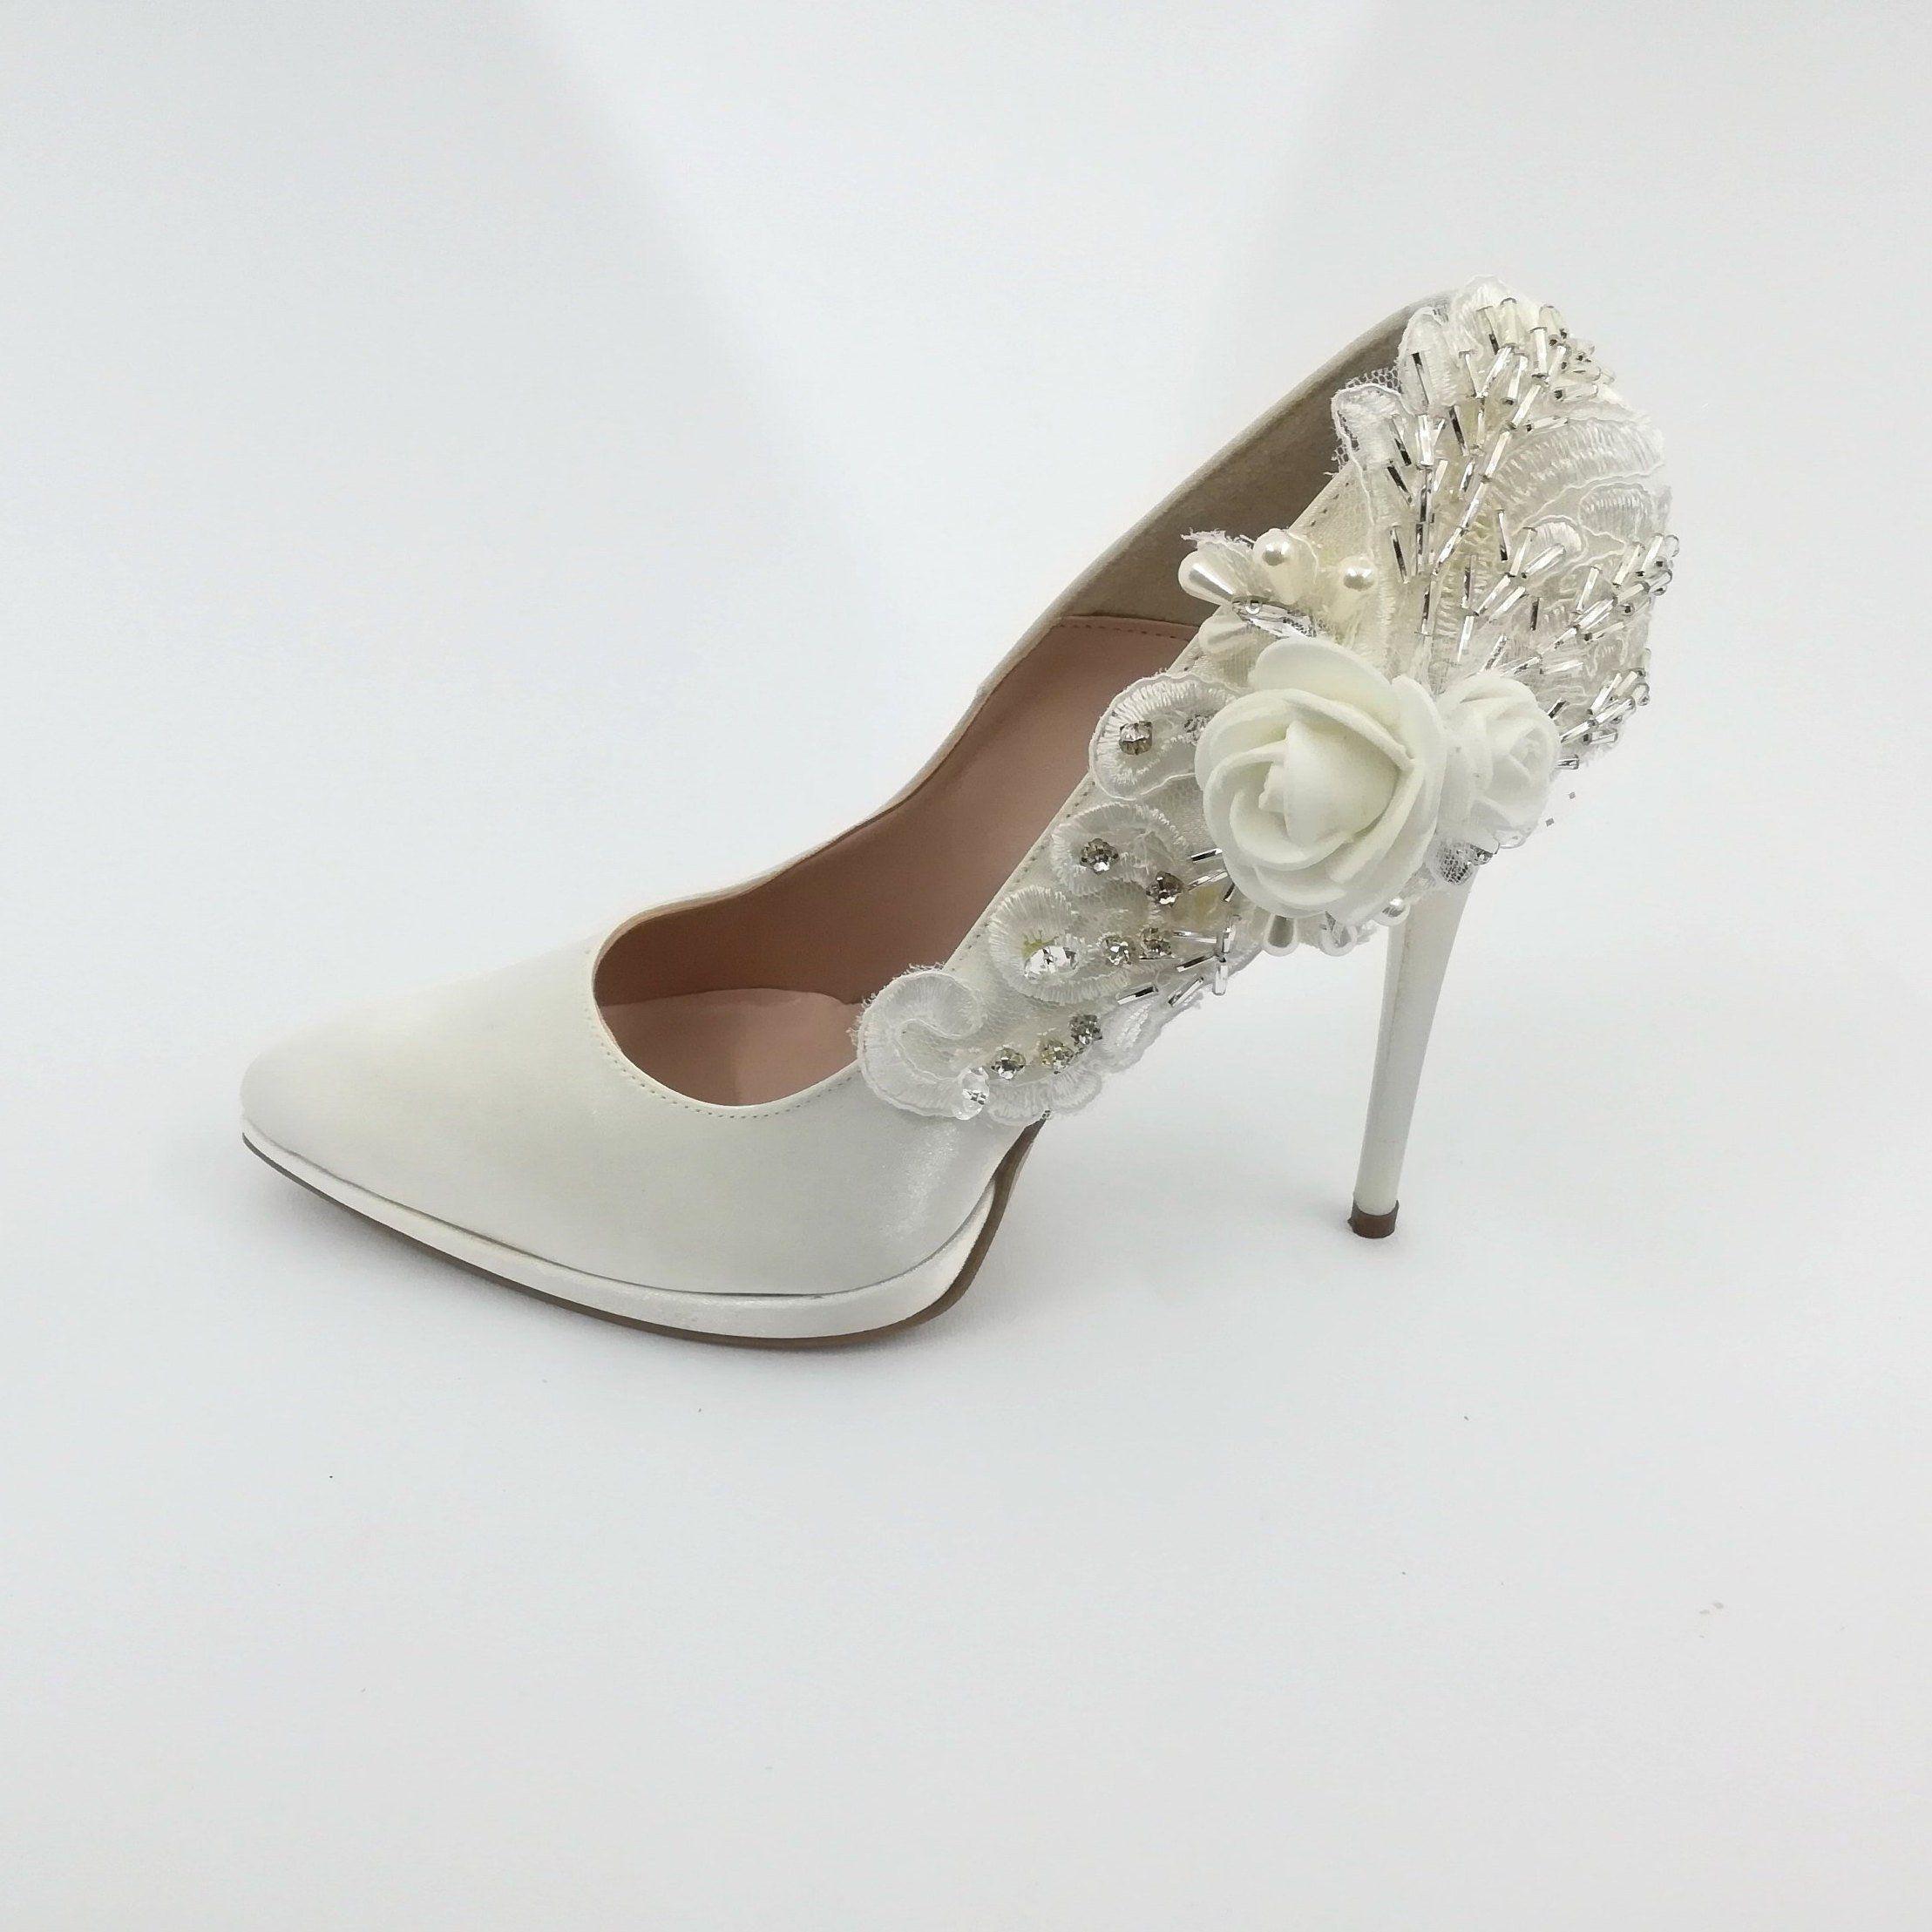 Scarpe Sposa Fiori.Custom Made In Italy Bridal Shoes Scarpe Da Sposa Scarpe E Sposa